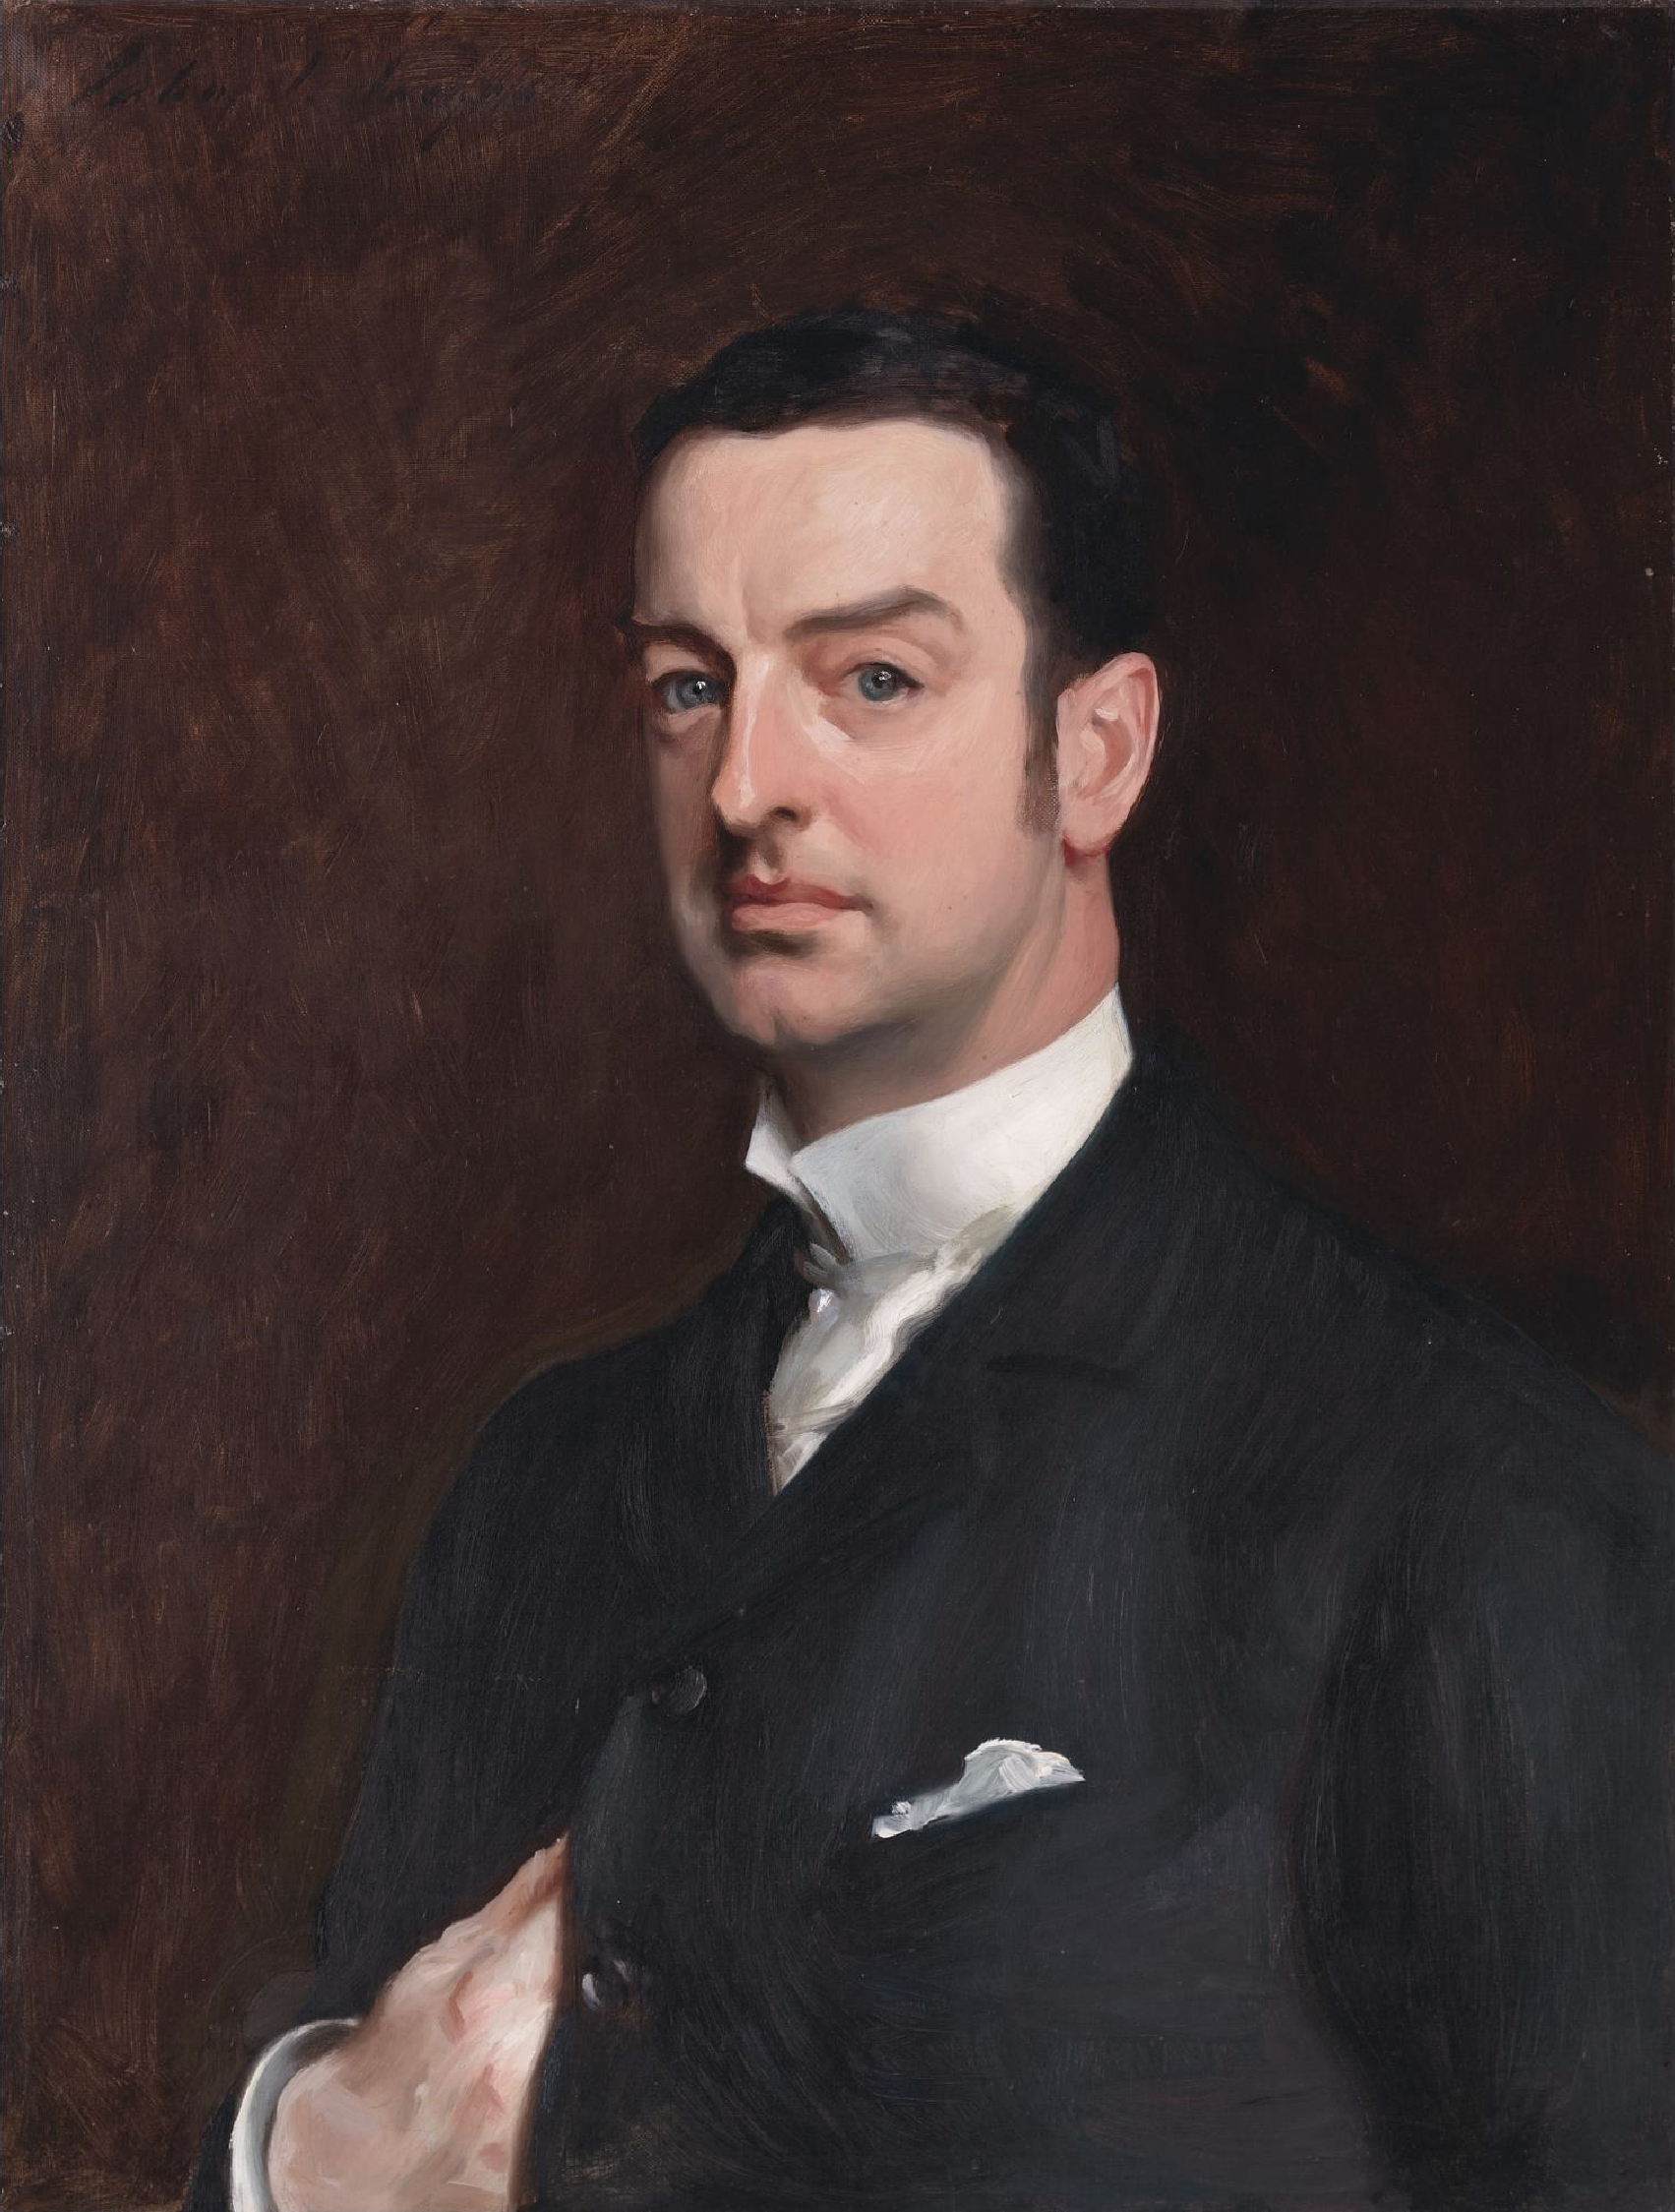 Description Cornelius Vanderbilt II by John Singer Sargent  1856-1925    Young Cornelius Vanderbilt